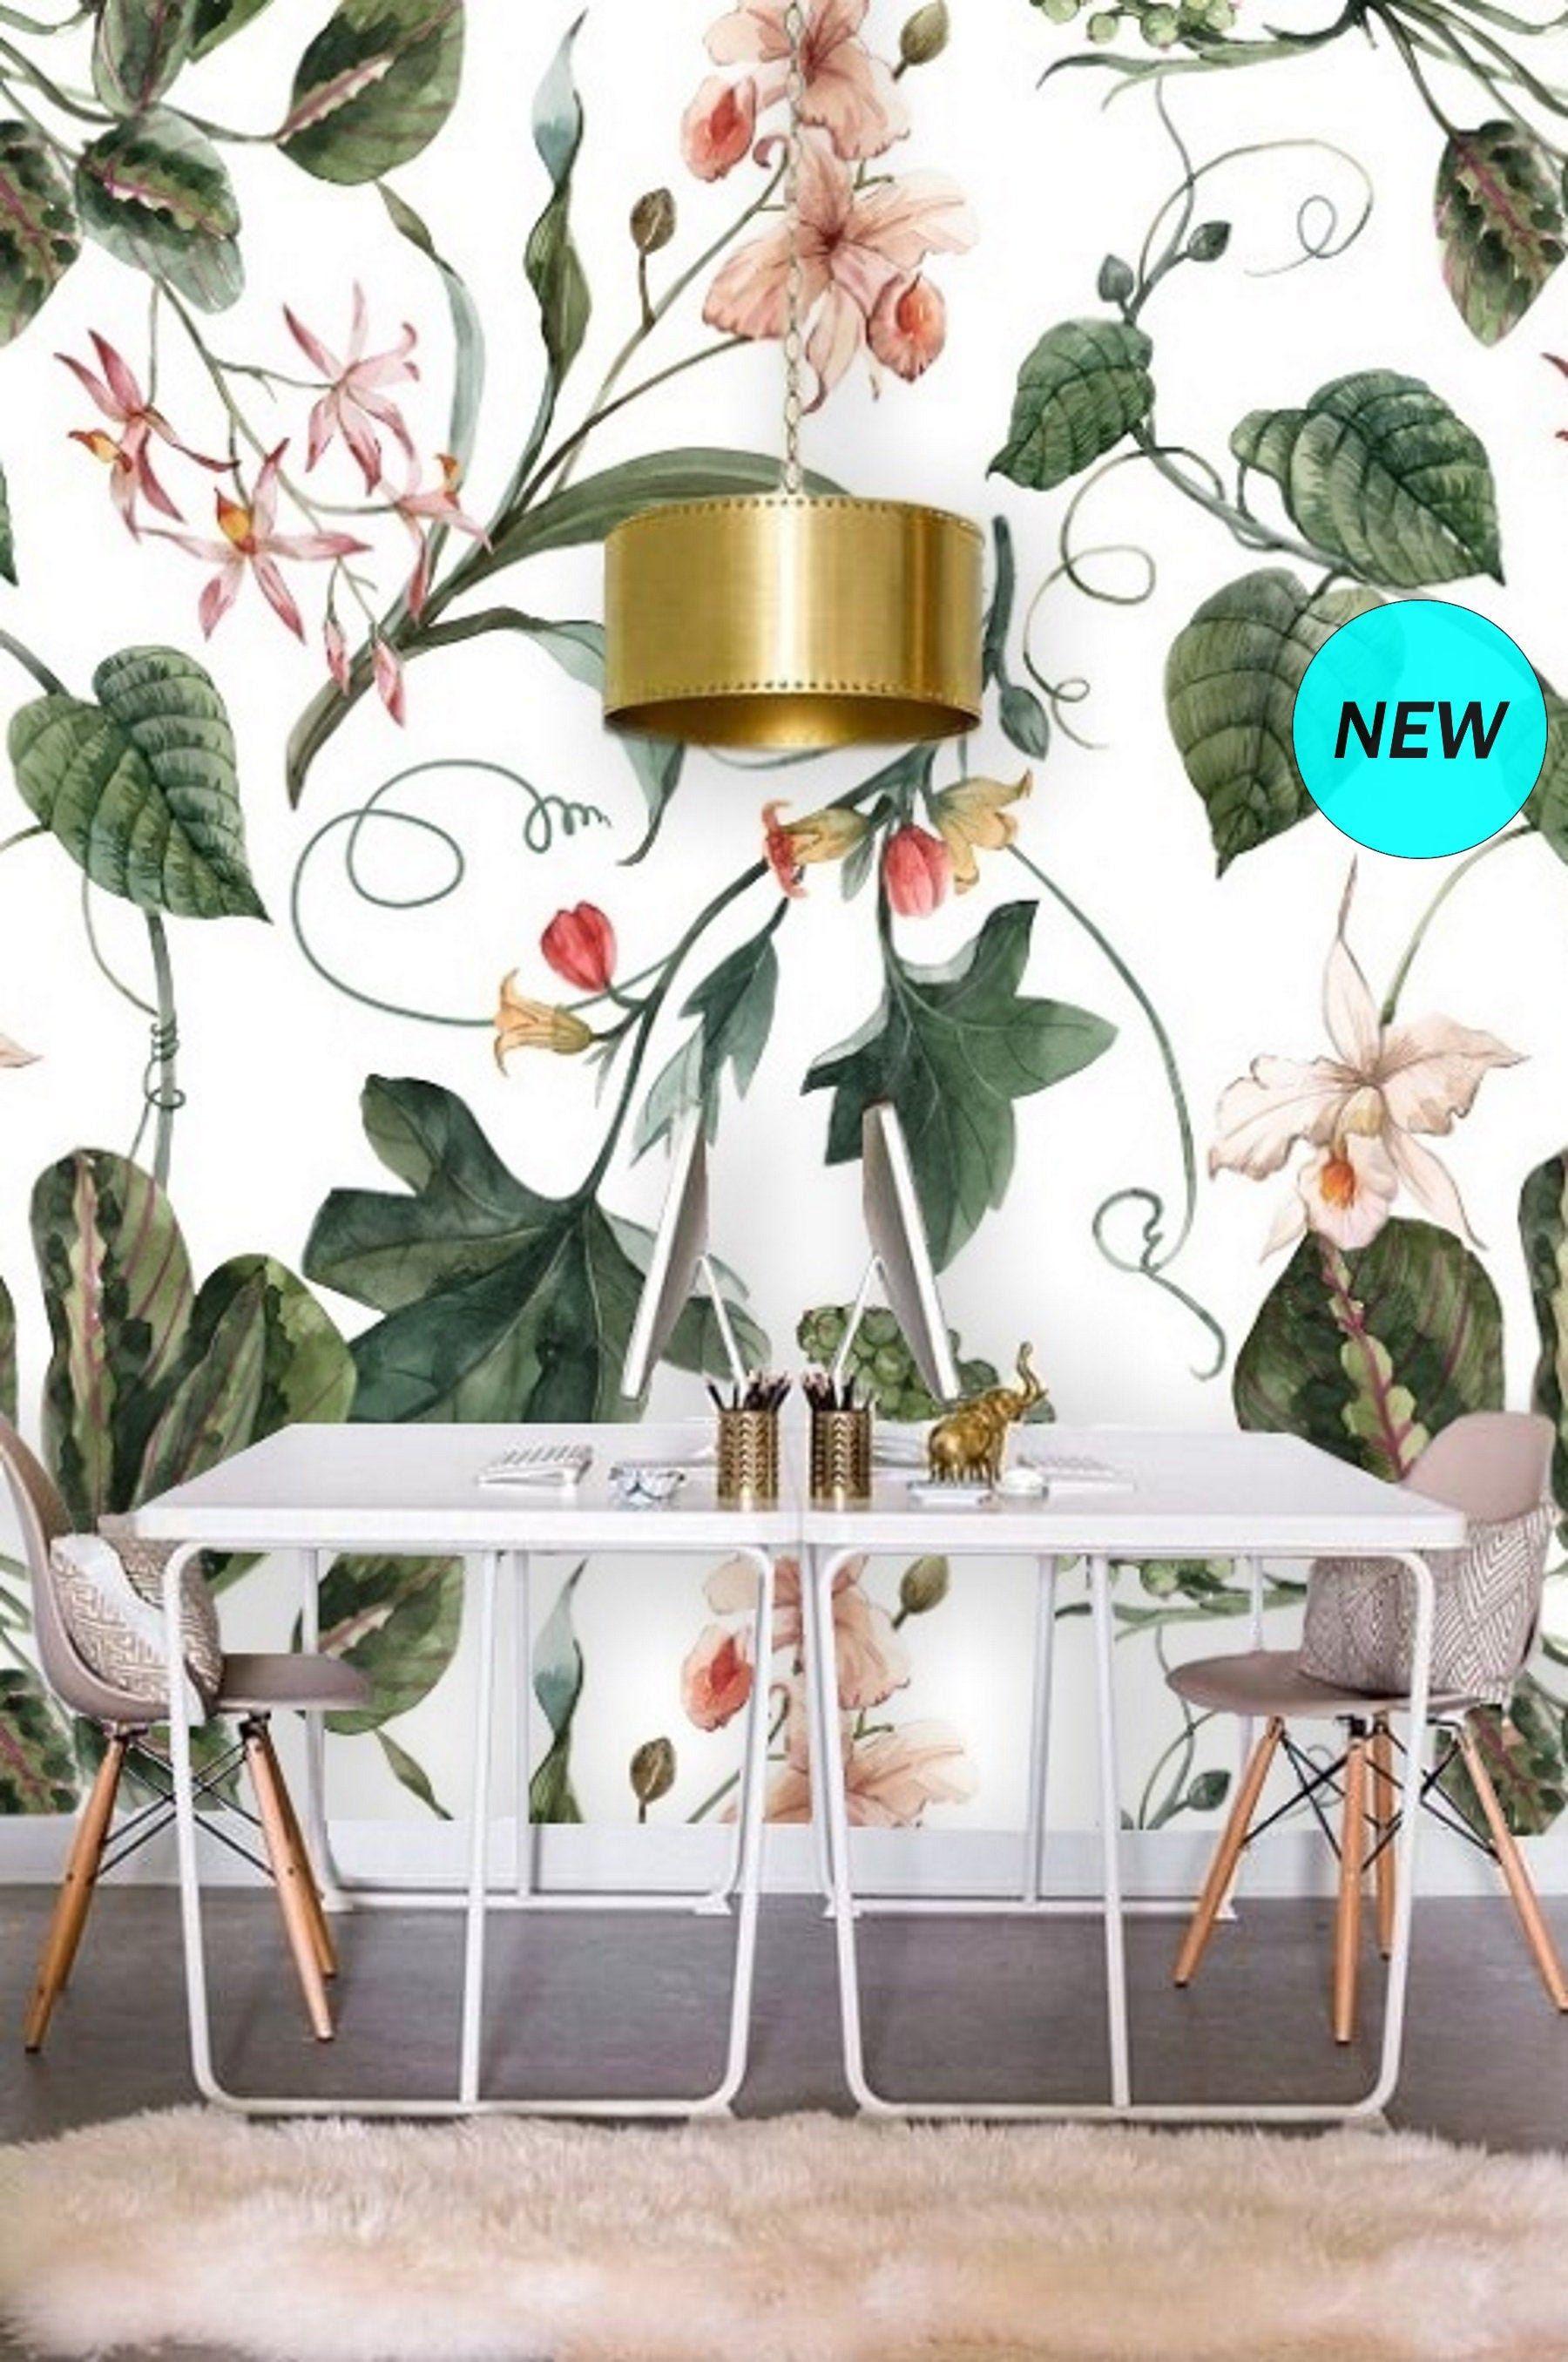 Floral Wallpaper Orchid Botanical Wallpaper Mural Removable Wallpaper Plants Self Adhesive Wallpaper Peel Floral Wallpaper Plant Wallpaper Mural Wallpaper